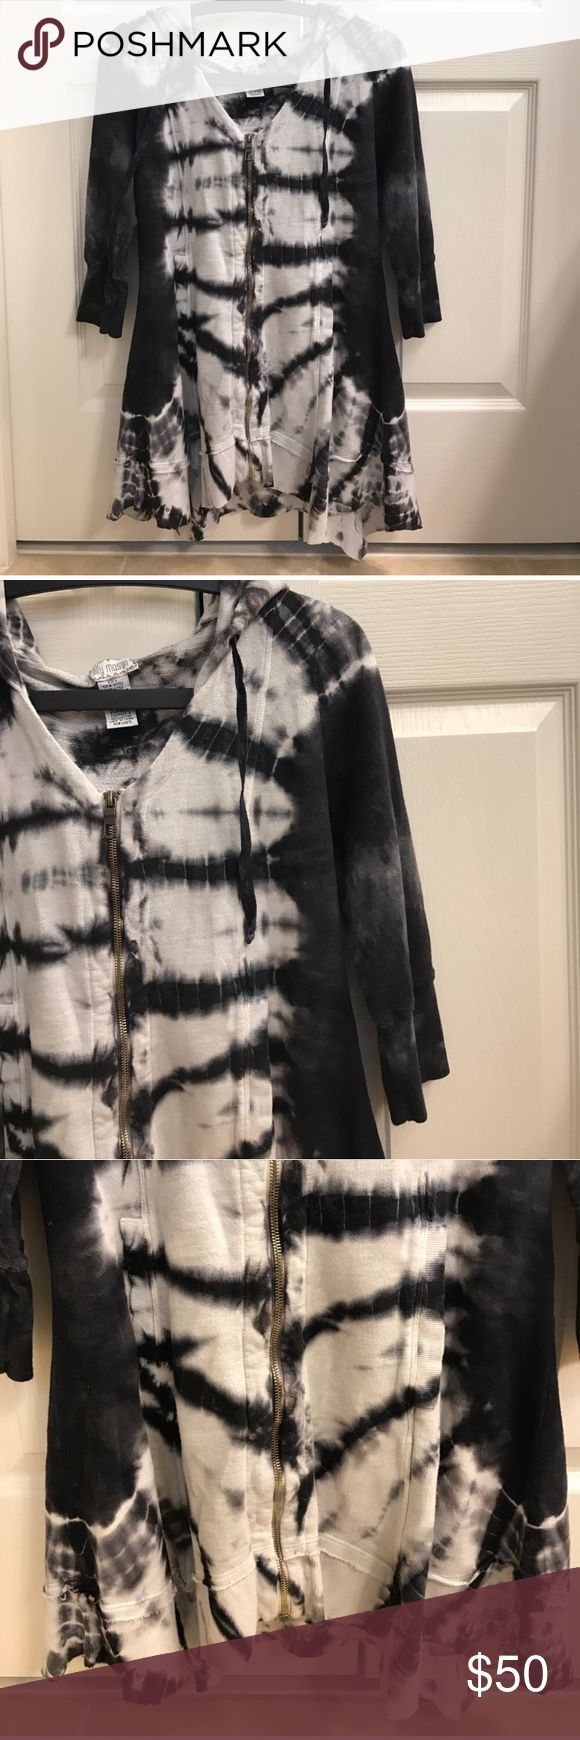 Size S Lilly Mason tie dye grey zip up top Size S Lilly Mason tie dye grey zip up top asymmetrical hem Lilly Mason Tops